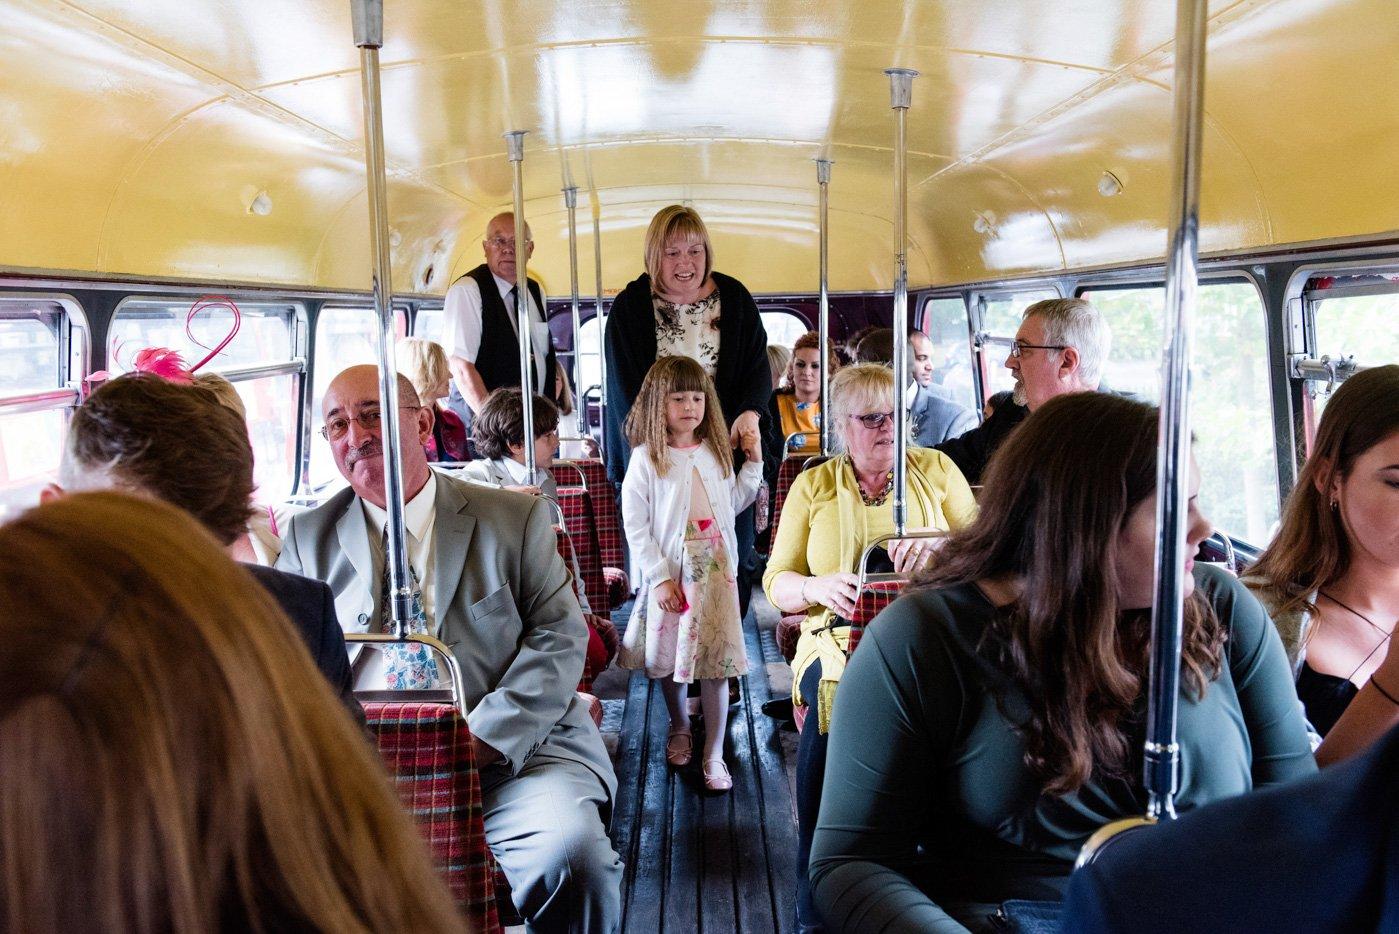 London bus wedding fun